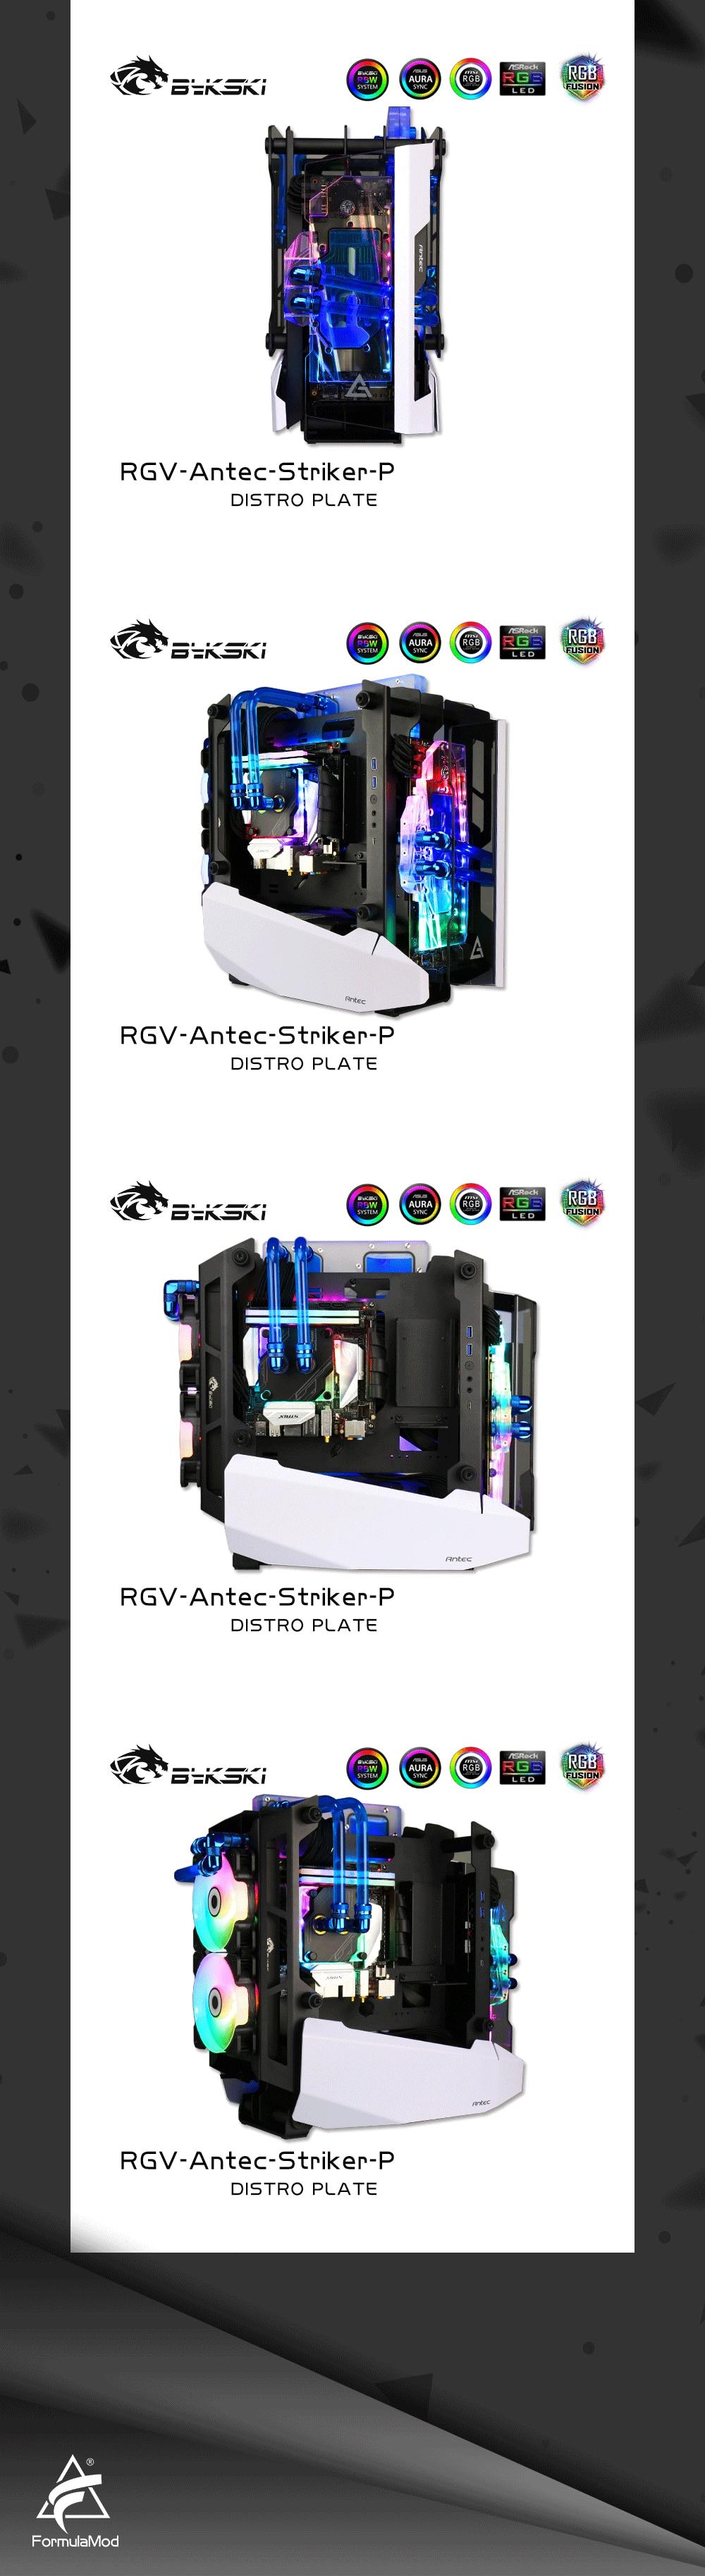 Bykski Waterway Cooling Kit For Antec Striker Case, 5V ARGB, For Single GPU Building, RGV-Antec-Striker-P